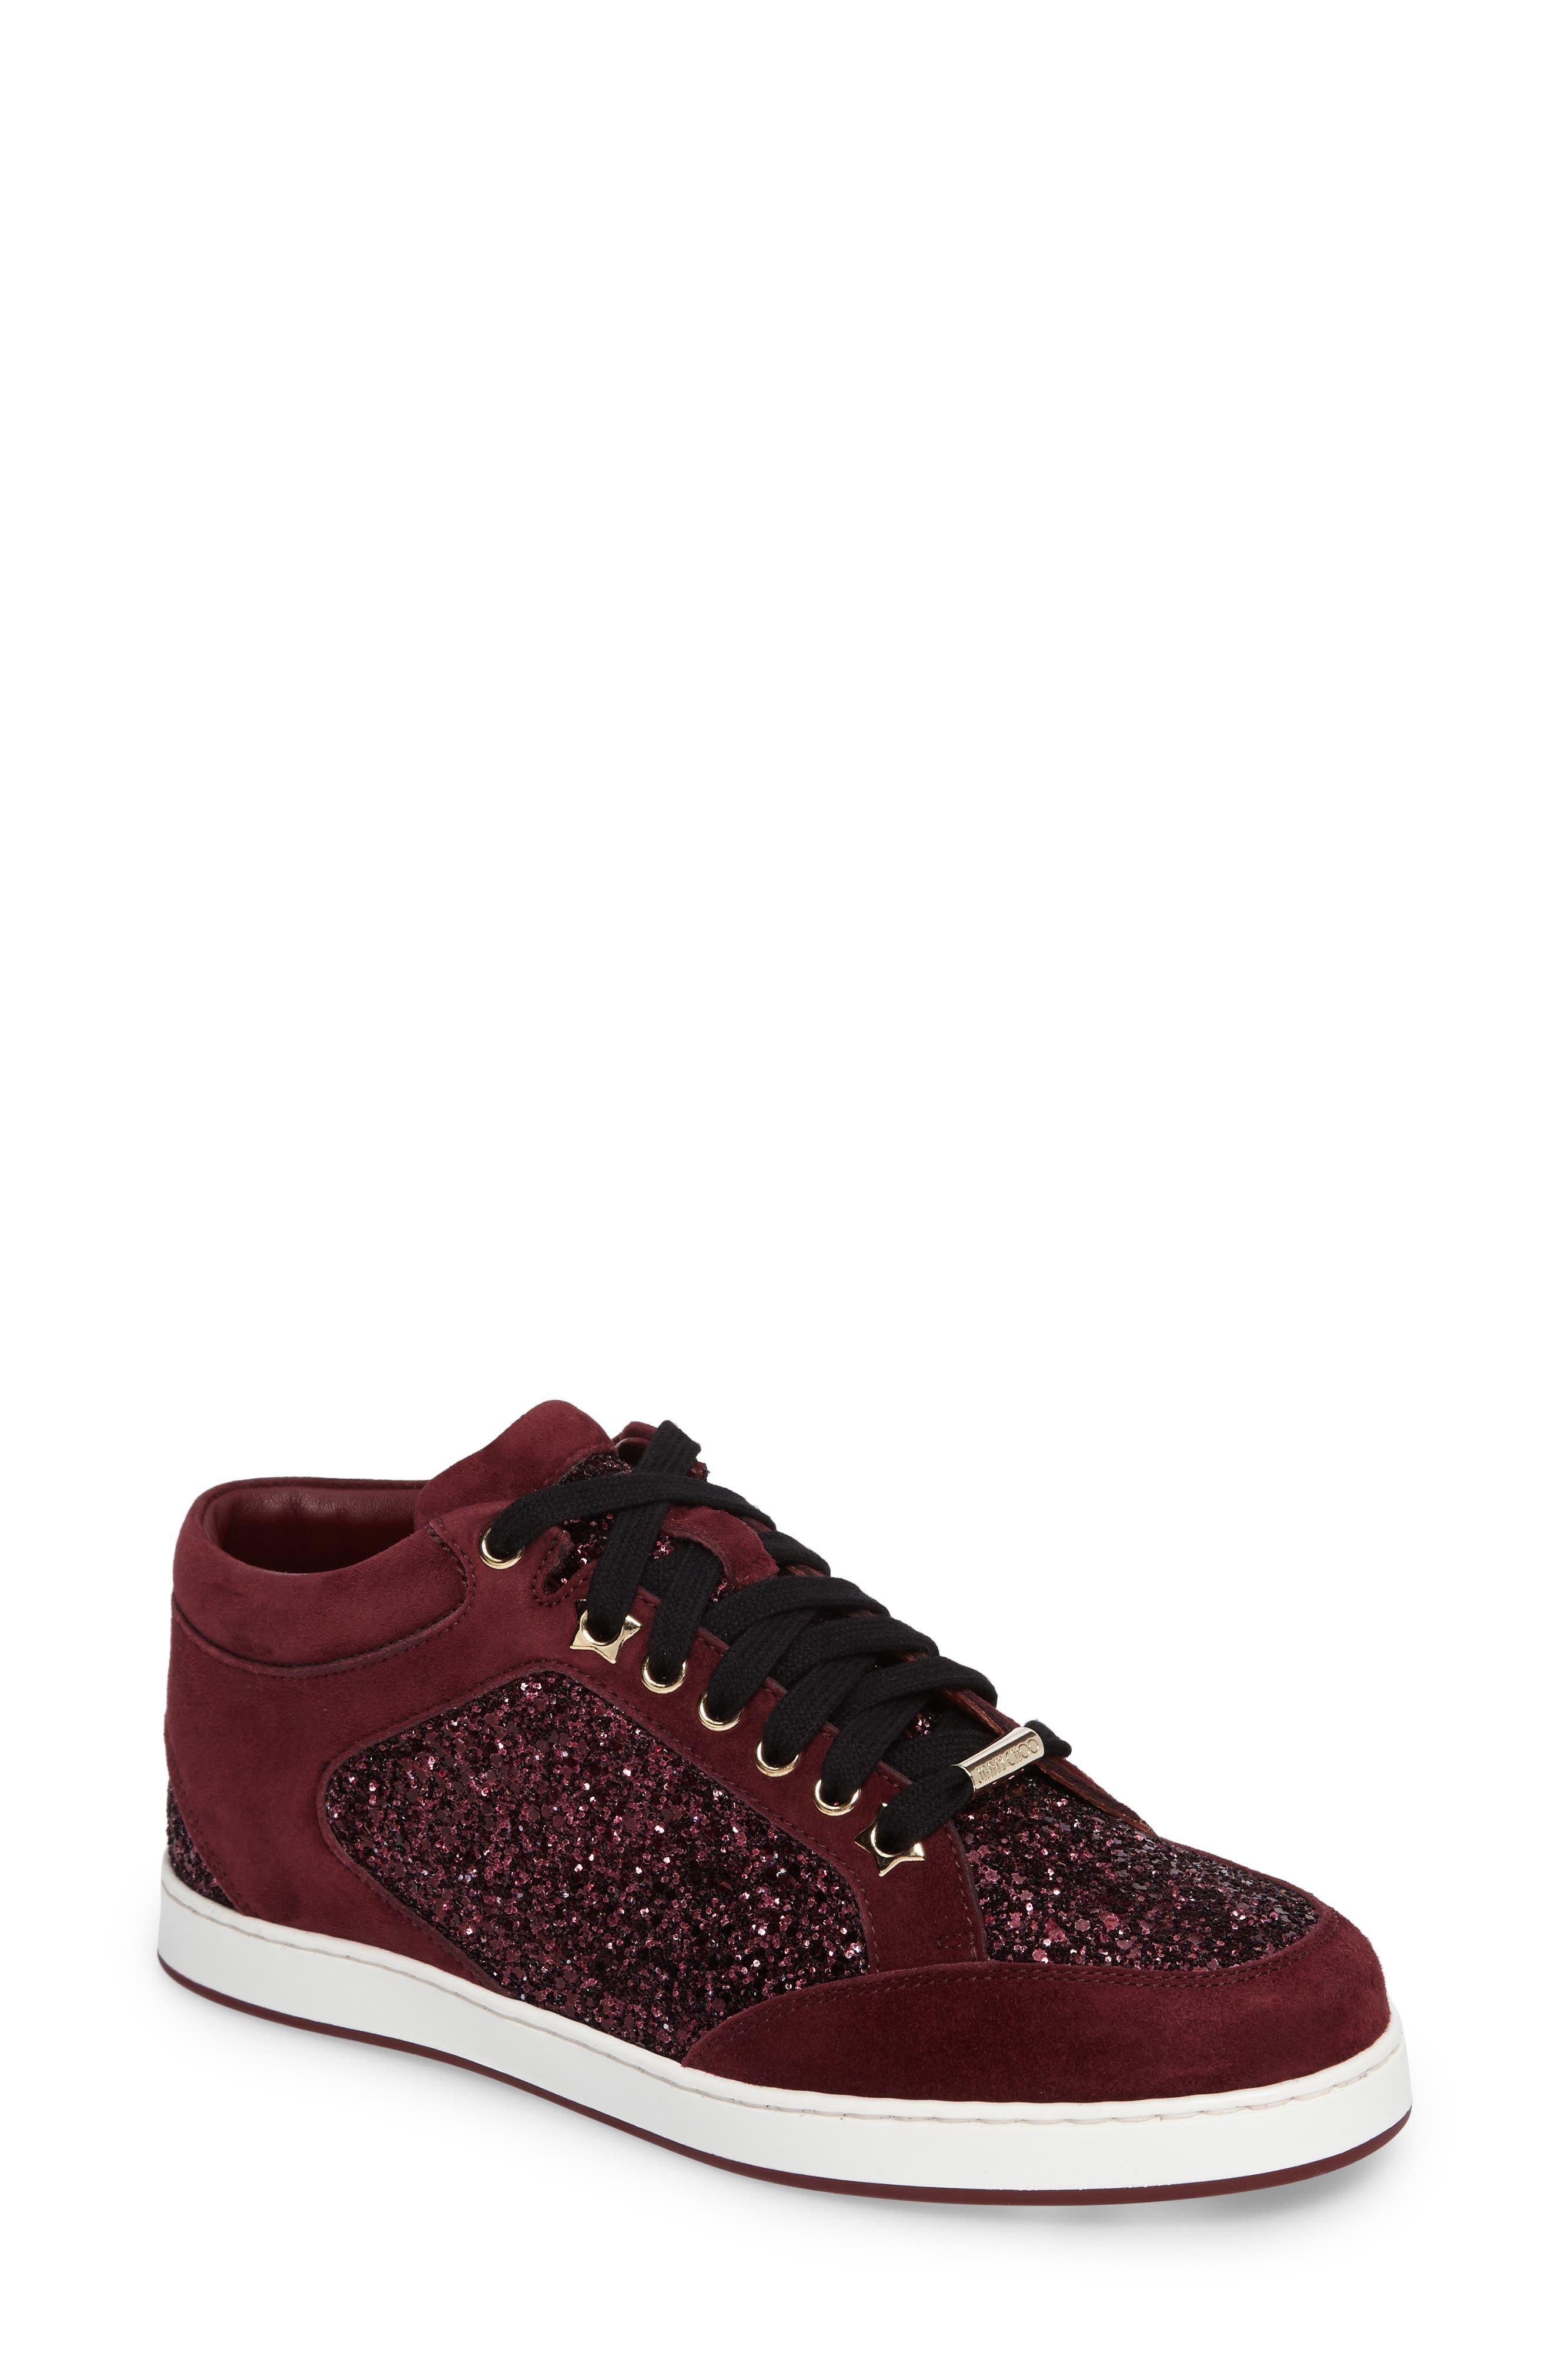 Alternate Image 1 Selected - Jimmy Choo Miami Low Top Sneaker (Women)